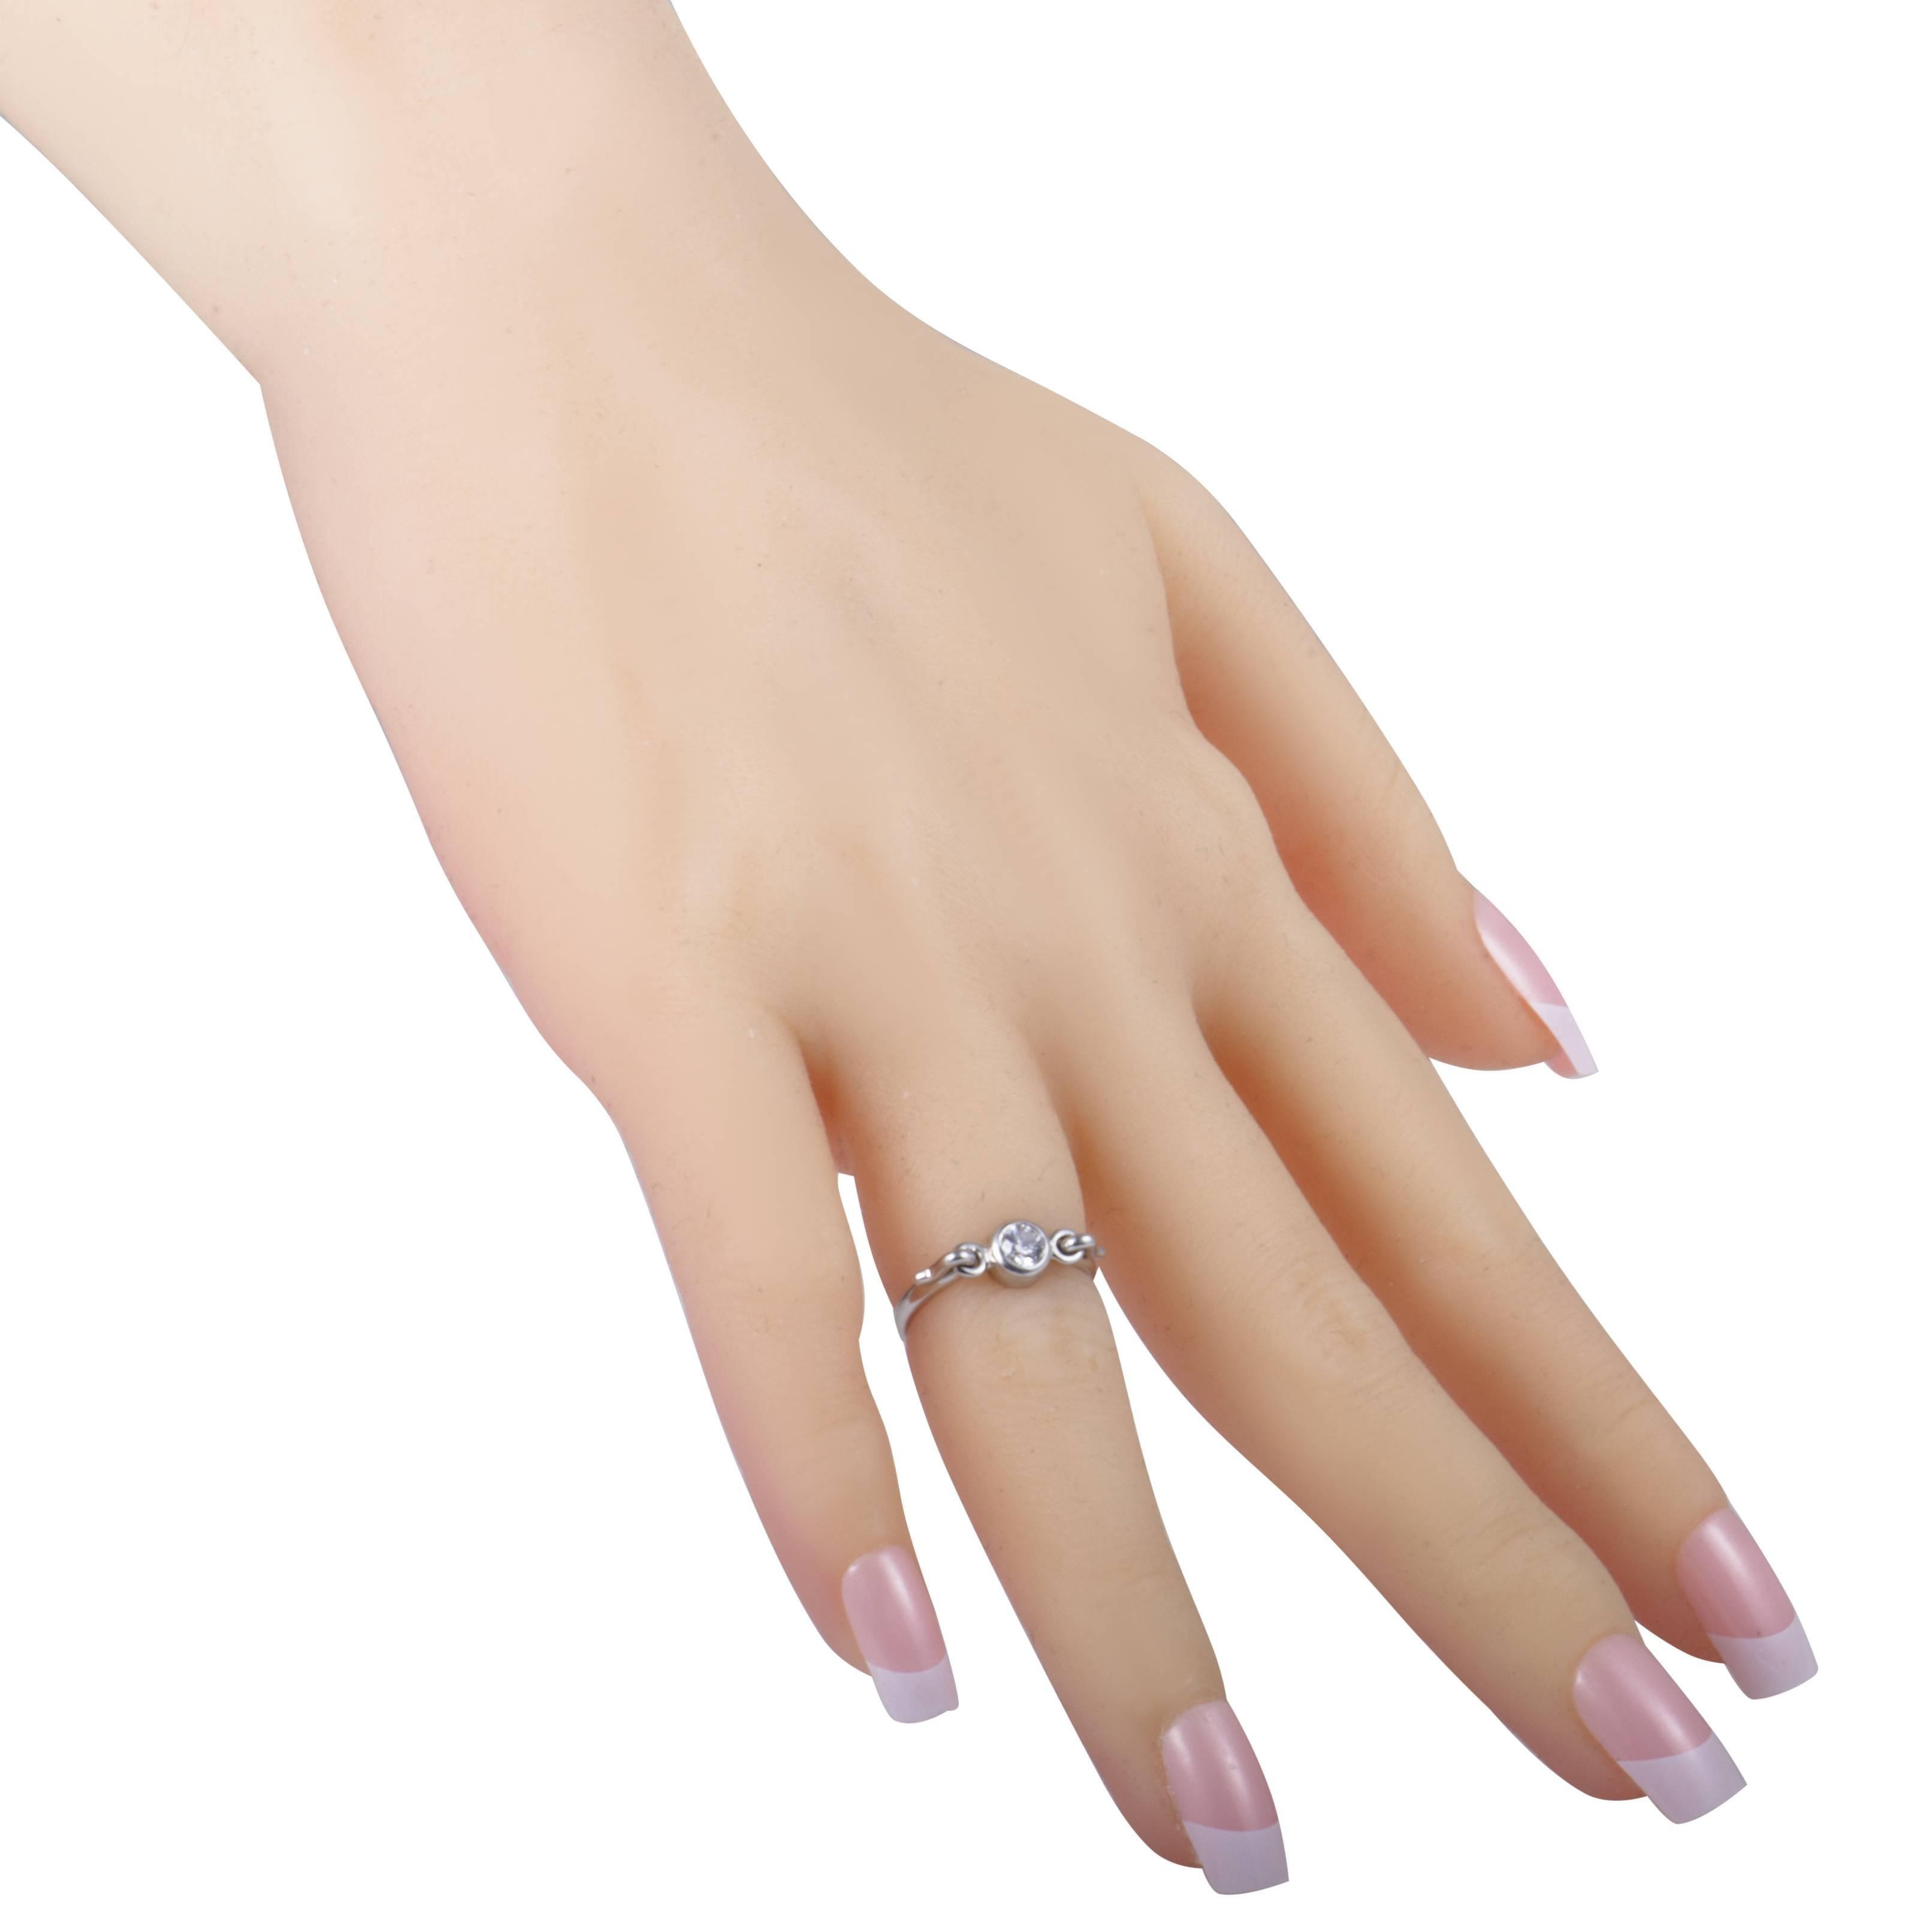 dac3f985e Tiffany and Co. Elsa Peretti Platinum Diamond Swan Ring at 1stdibs